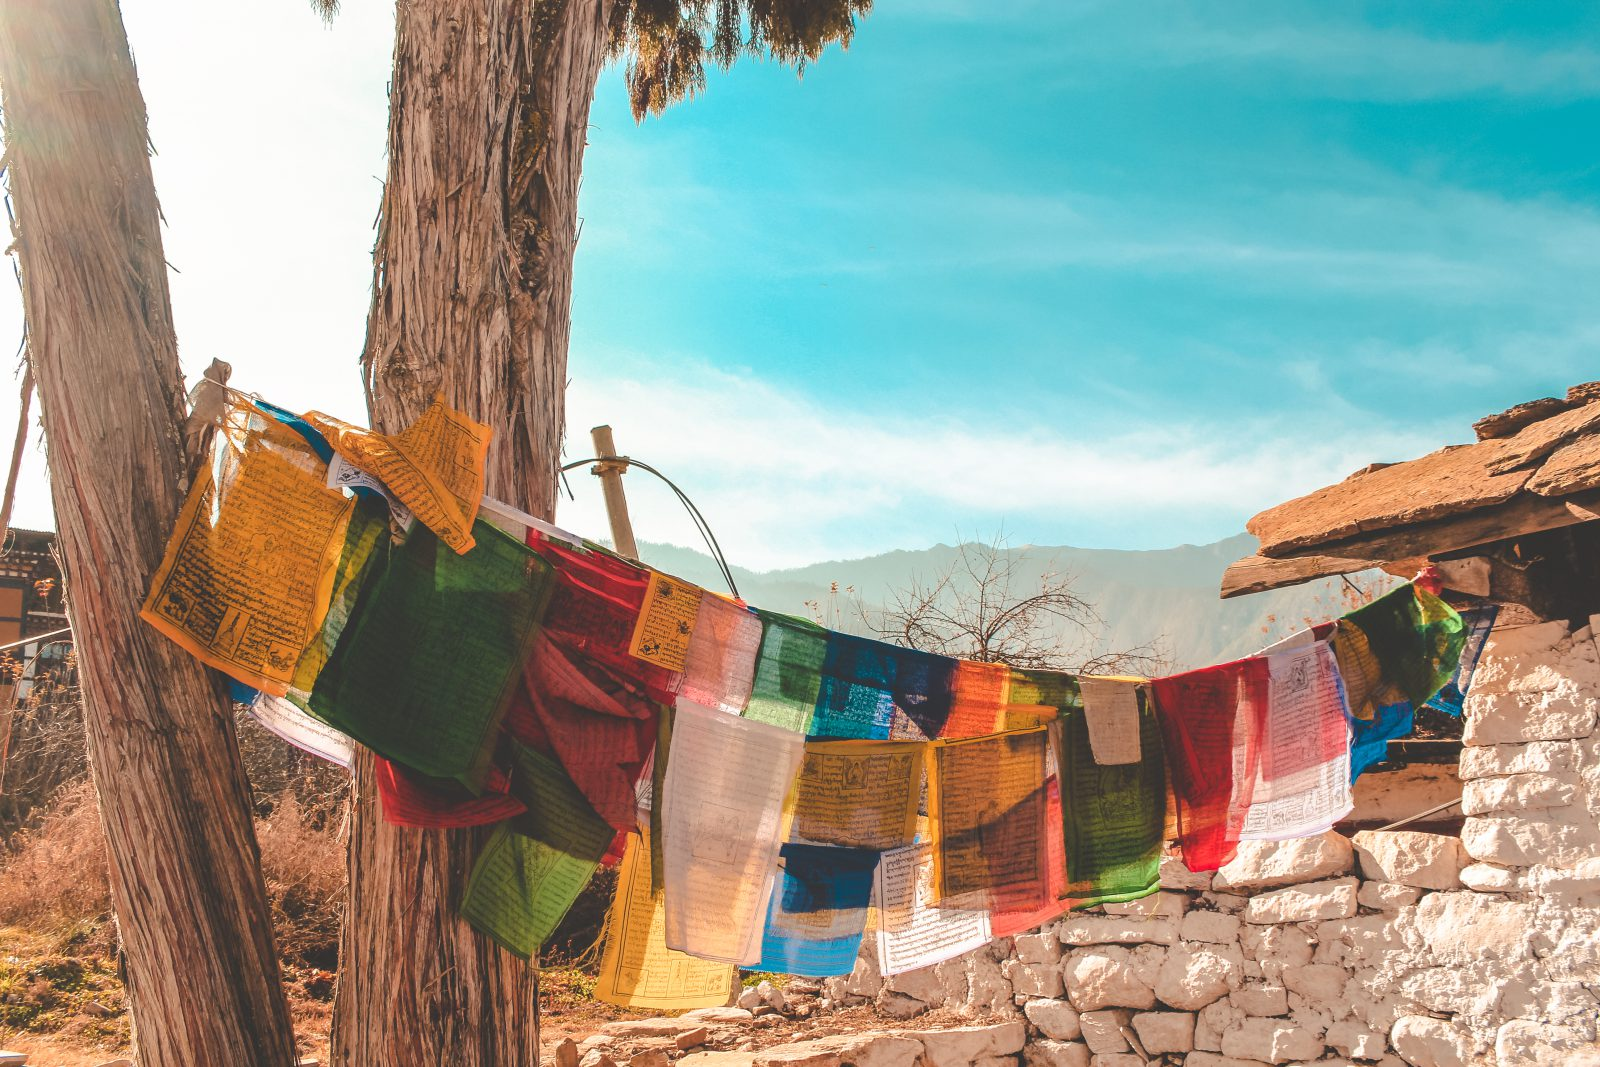 Bhutan - Königreich des Glücks. Photo by Prateek Katyal